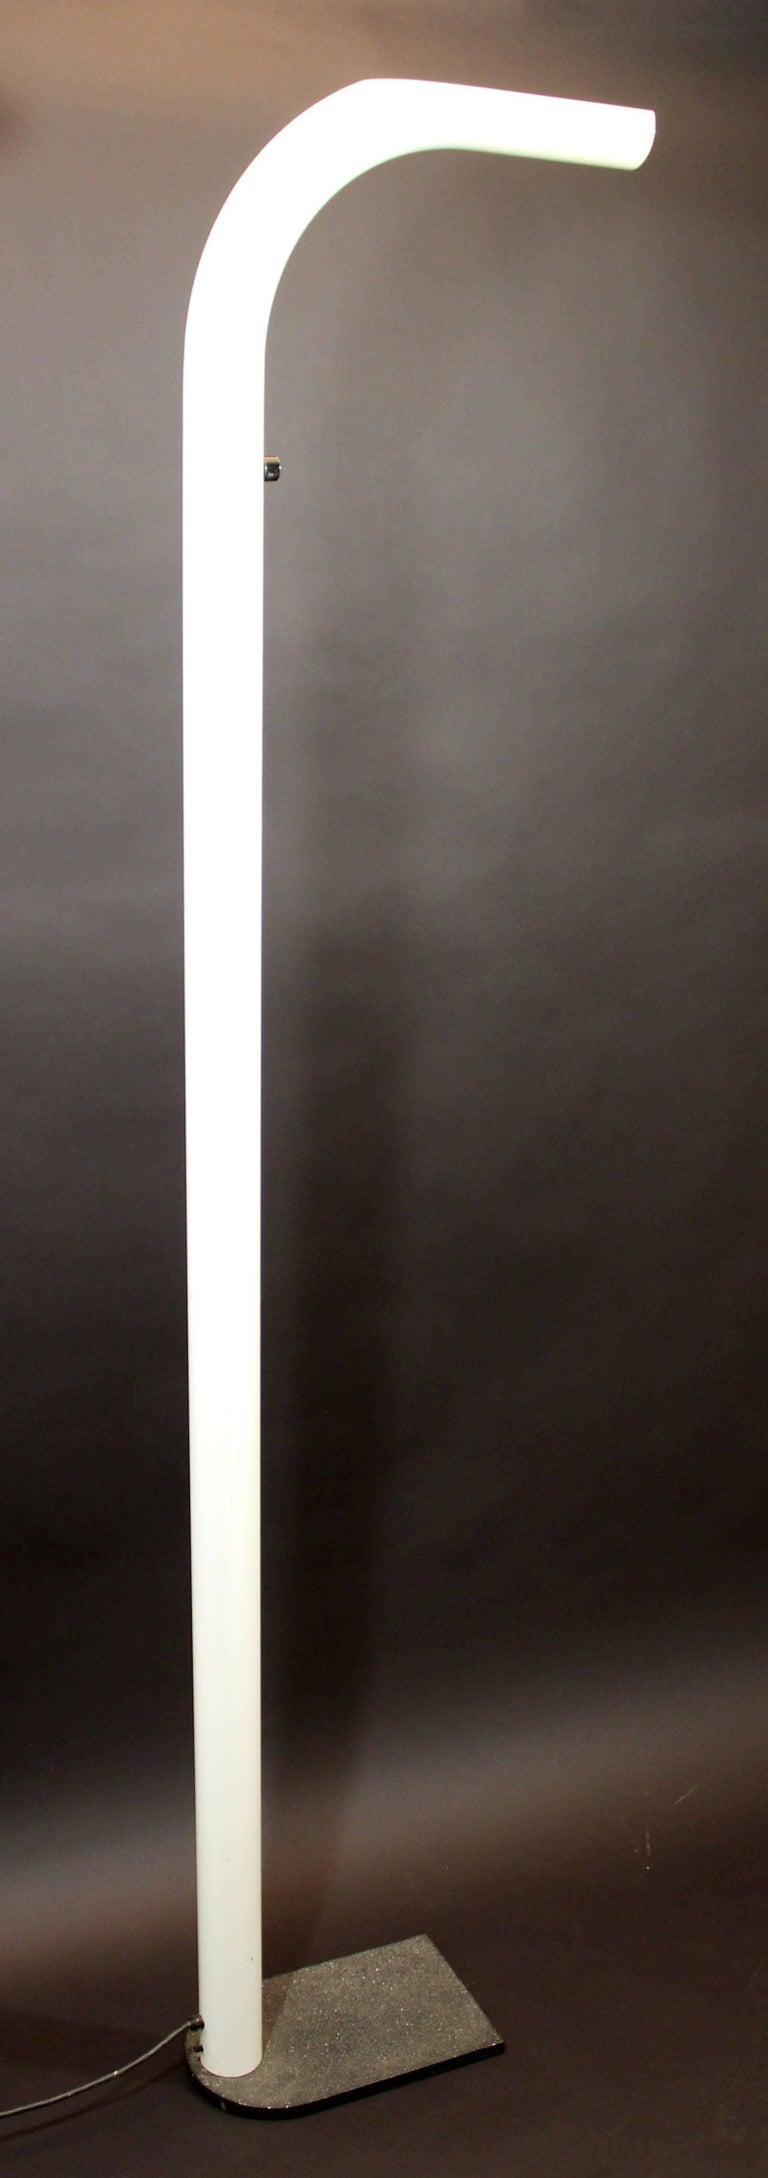 Italian Mid-Century Modern White Lacquer Metal Halogen Oca Floor Lamp by Eleusi, Italy For Sale